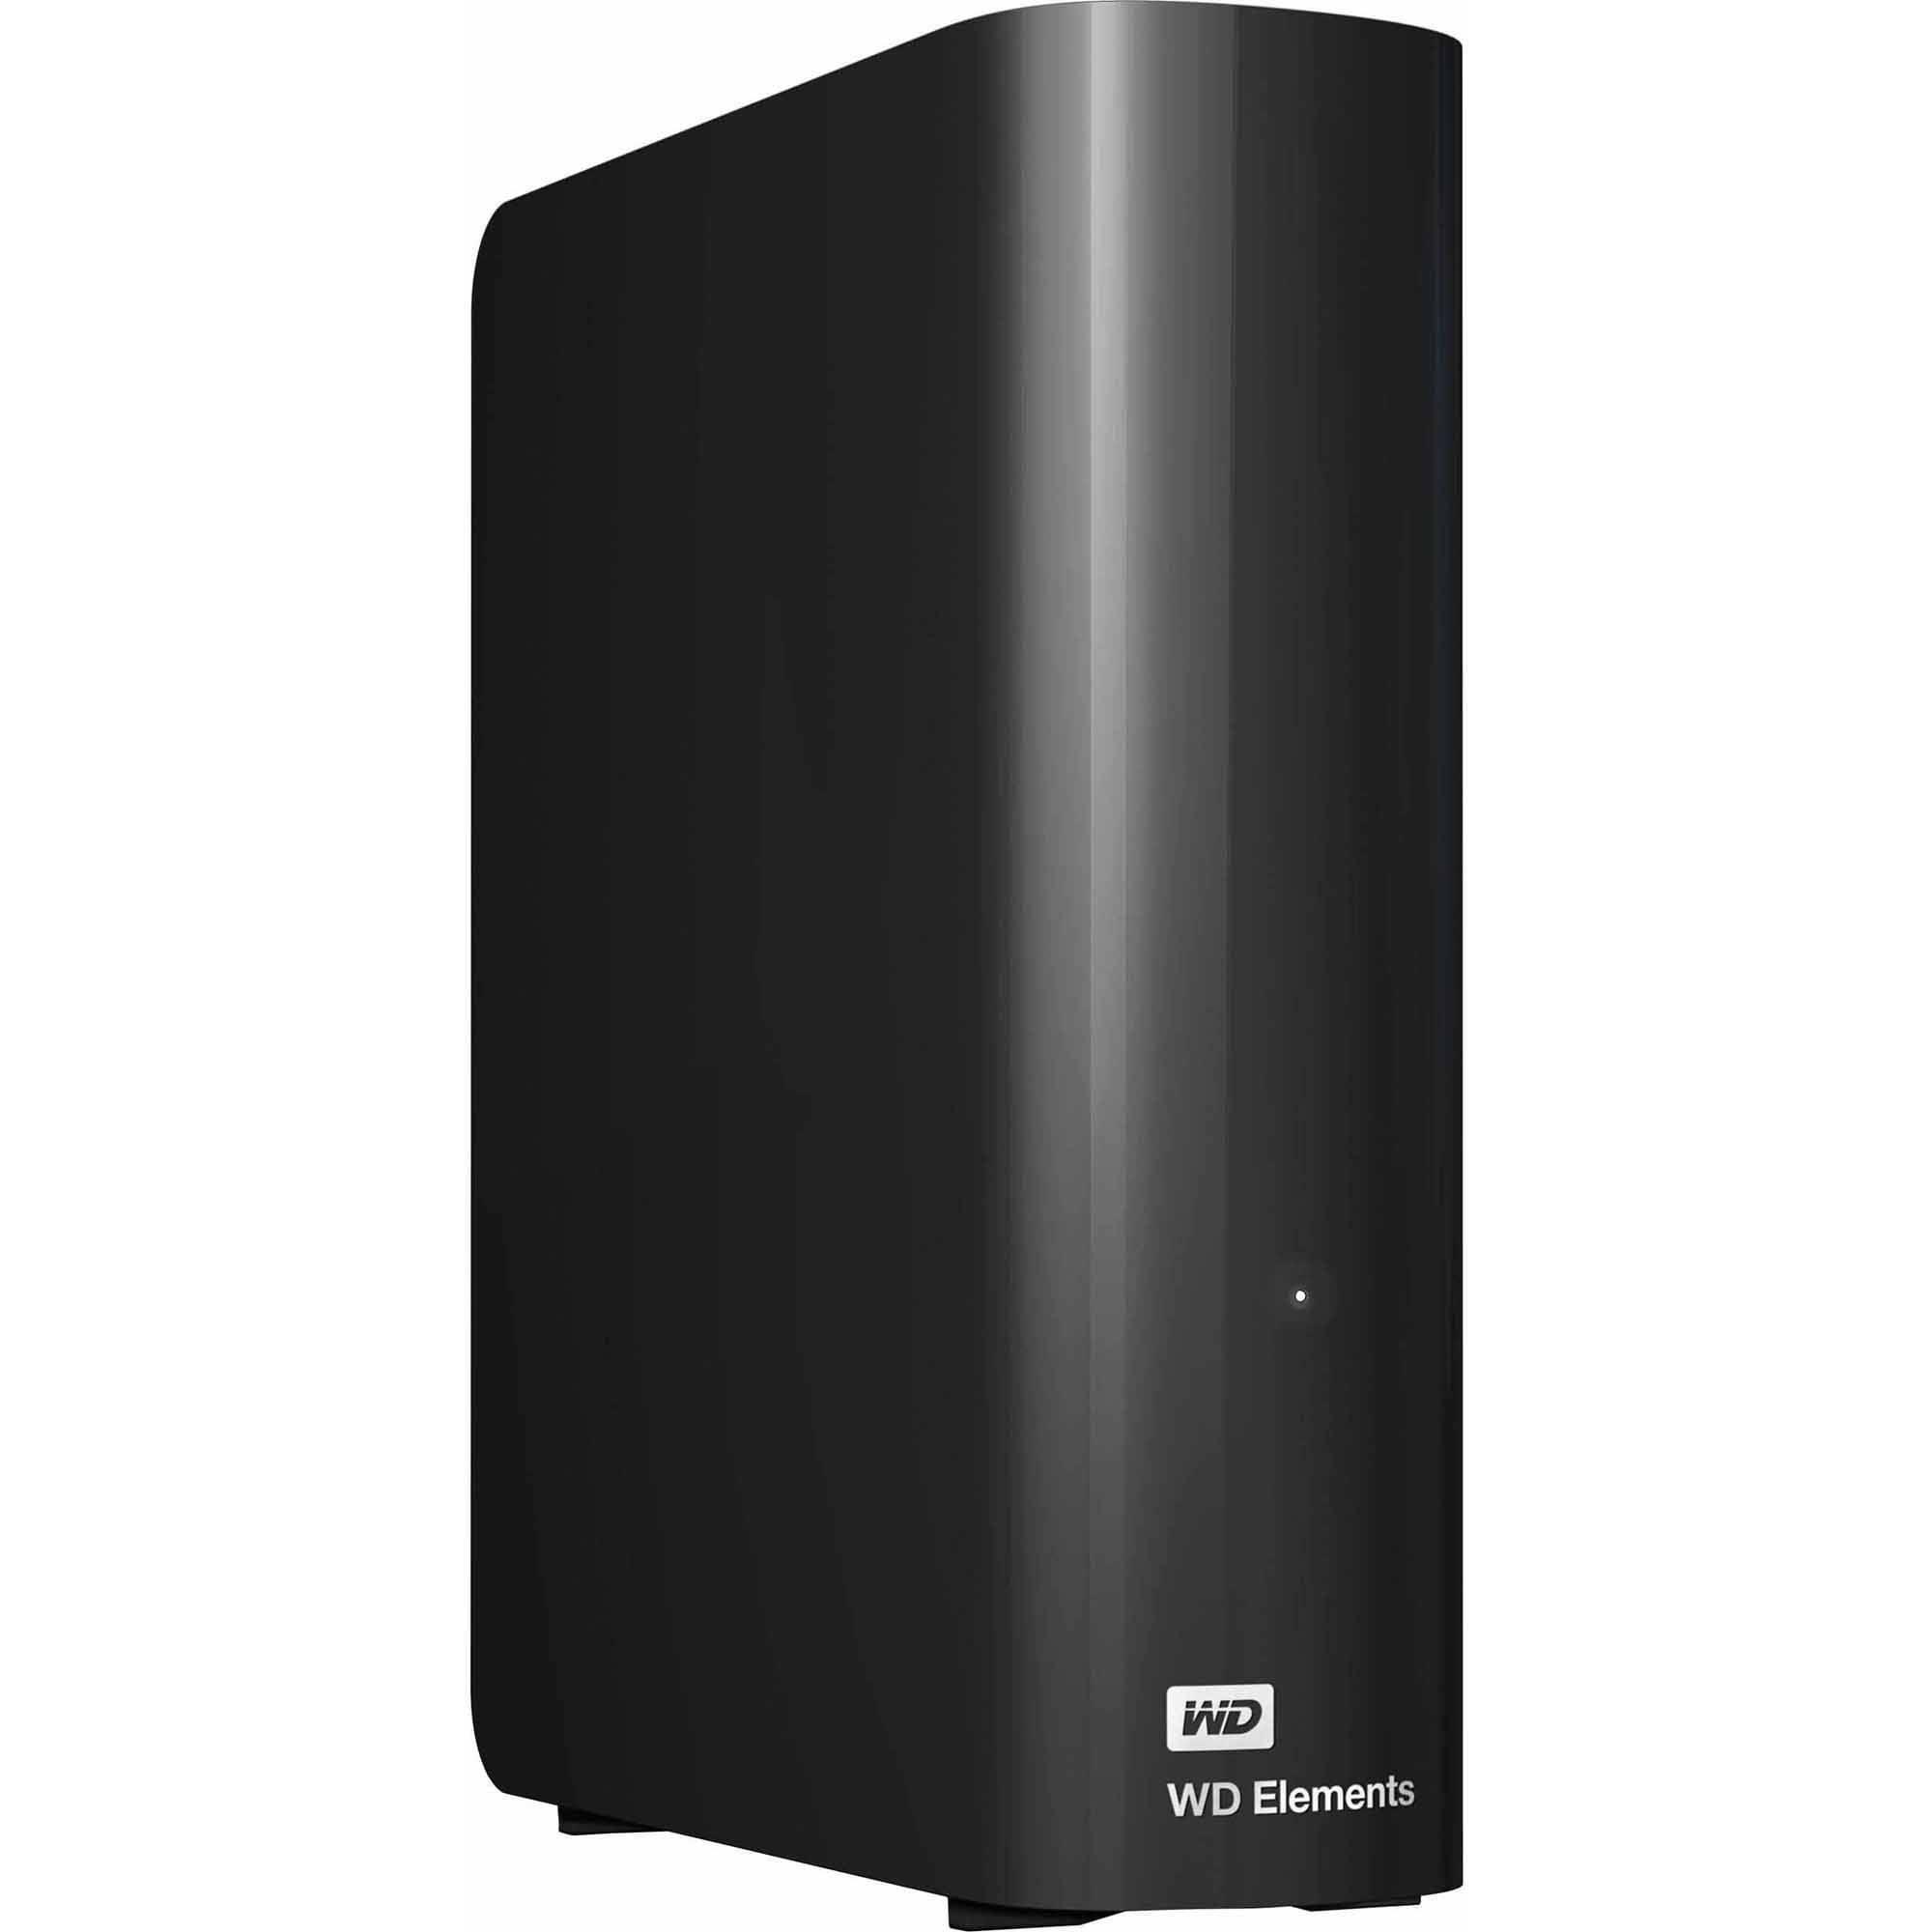 Western Digital 4TB Elements Desktop USB 3.0 Hard Drive -...